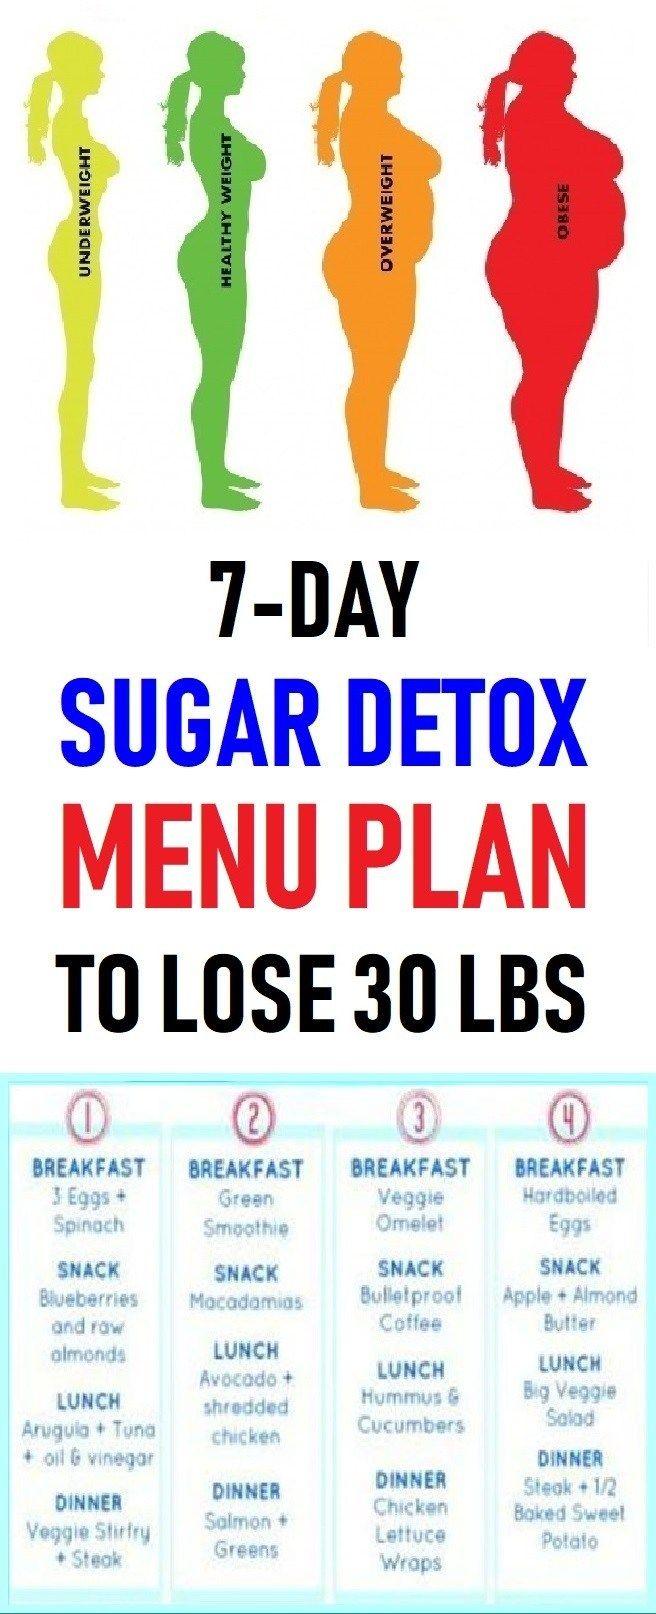 7-Day Sugar Detox Menu Plan and Lose 30 lbs #sugardetoxplan